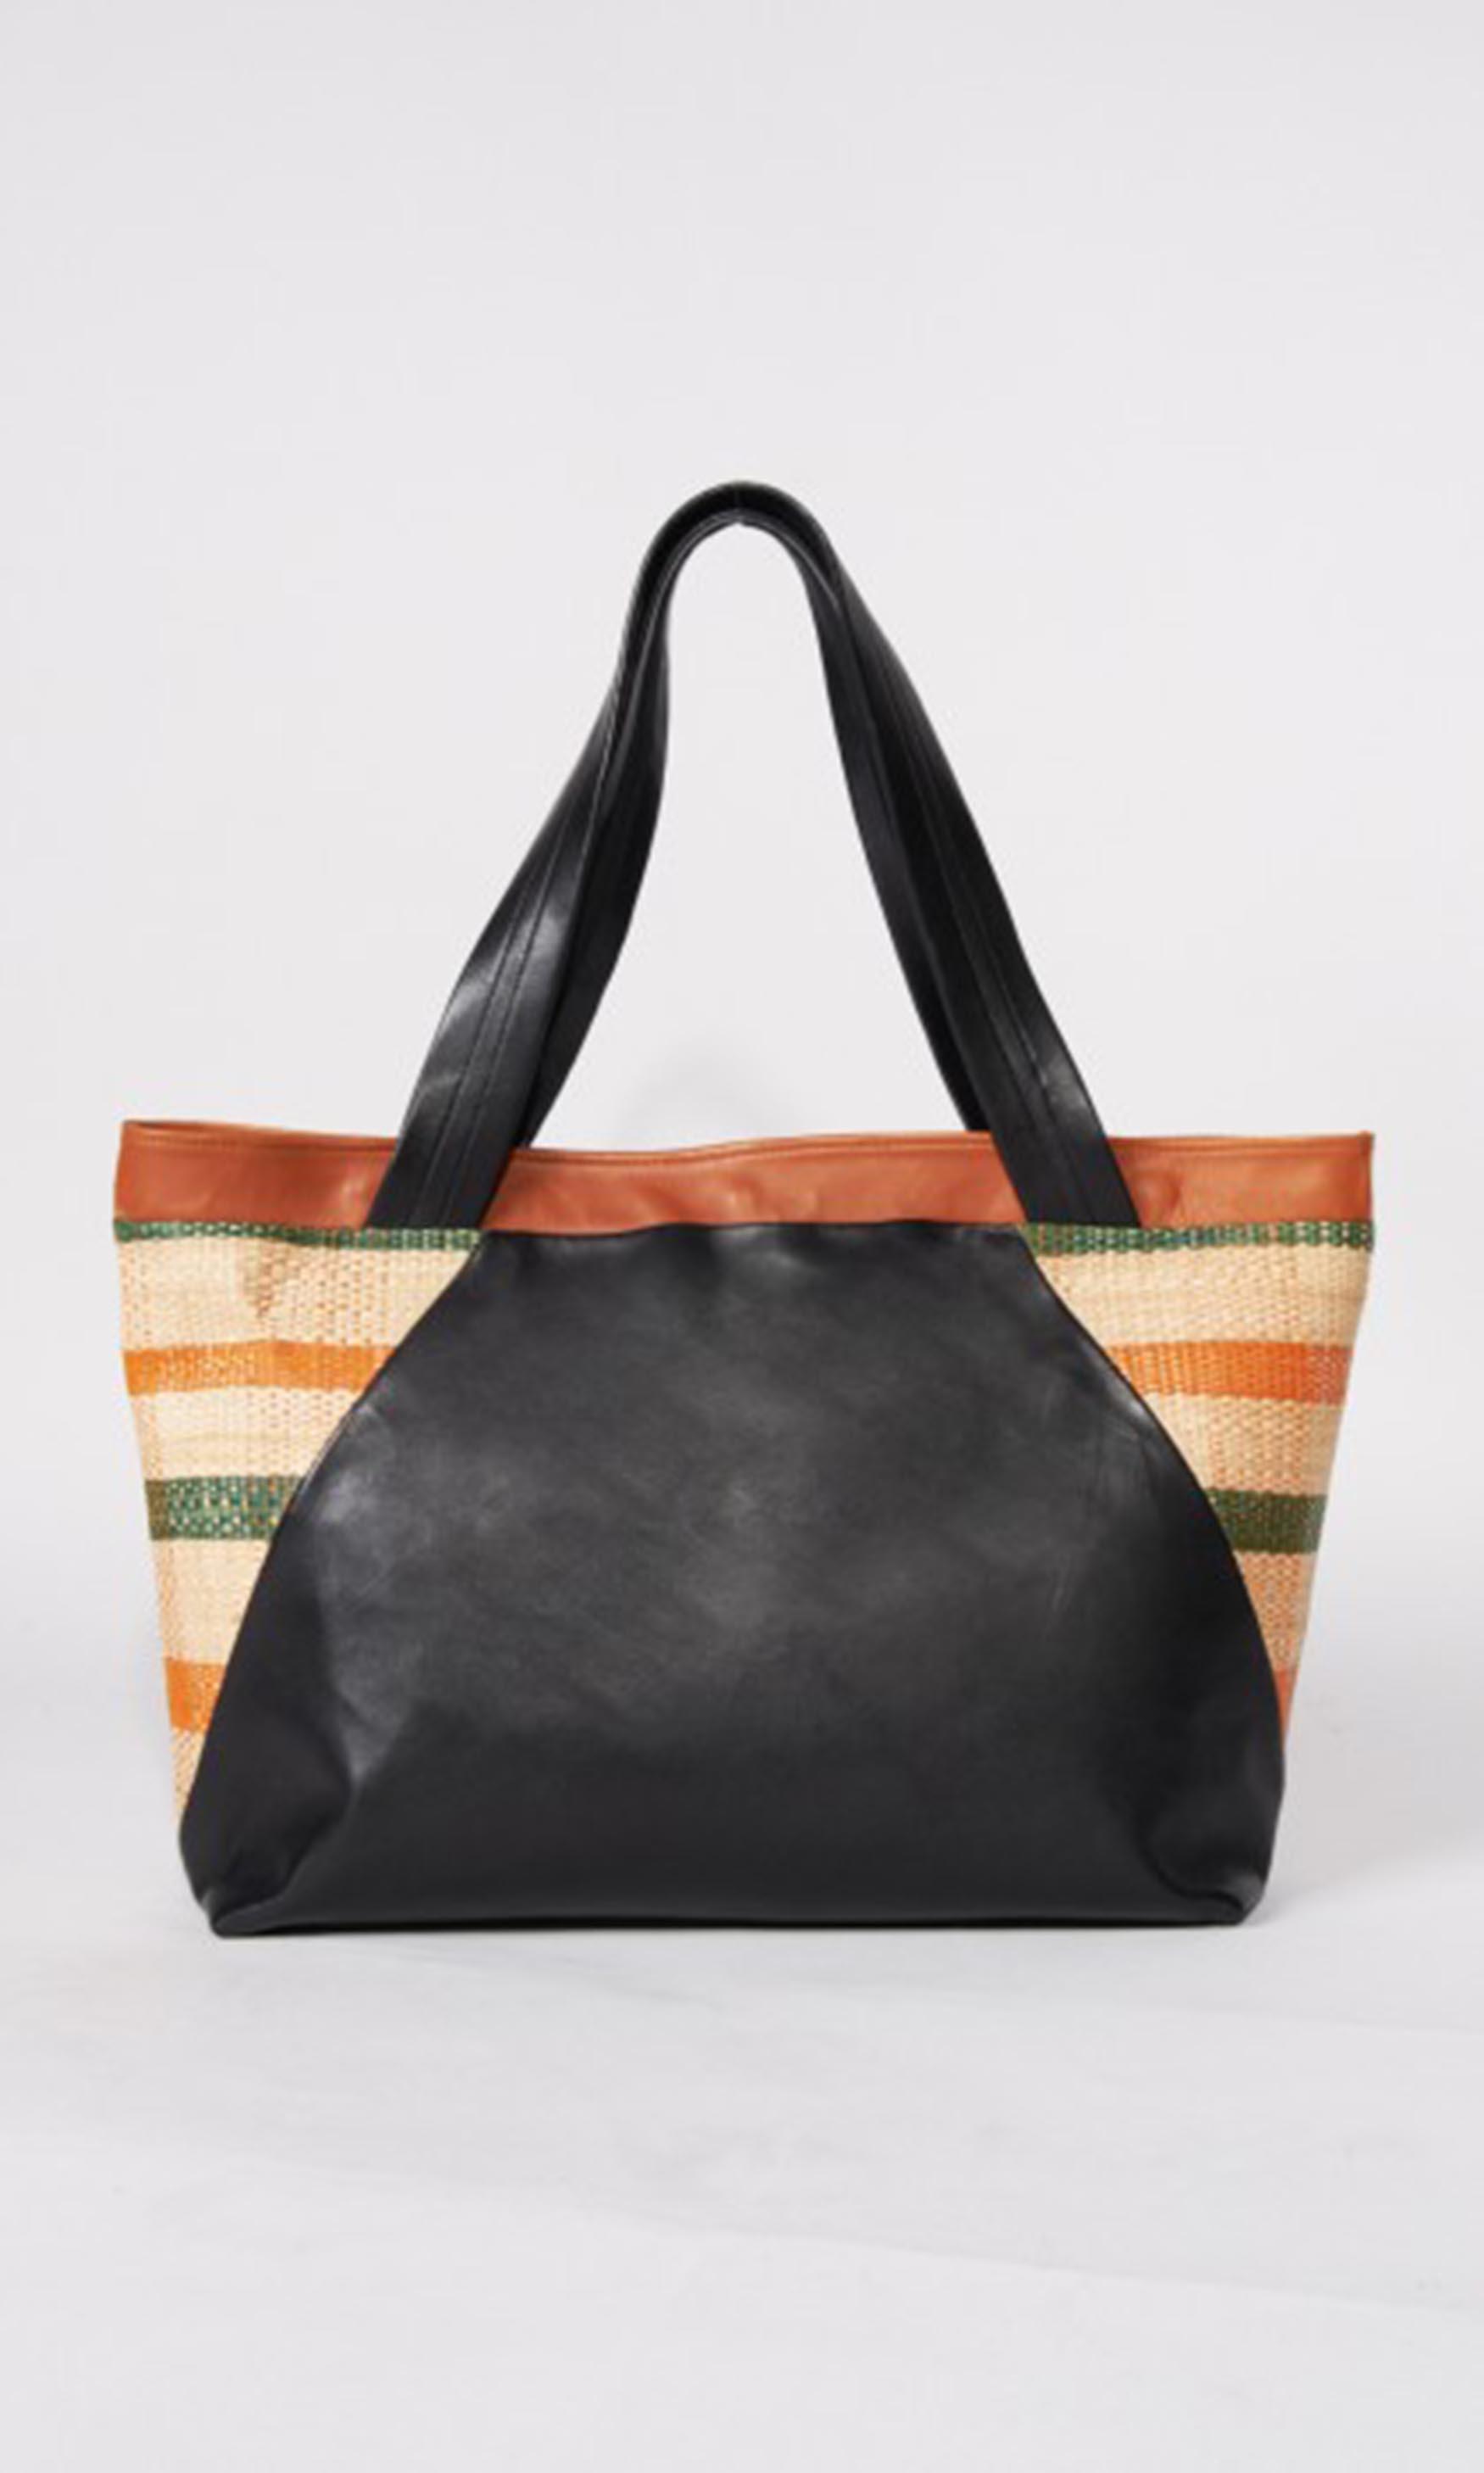 raphia-leather-totebag-shopping-bag-madeinafrica-madeingabon.jpg